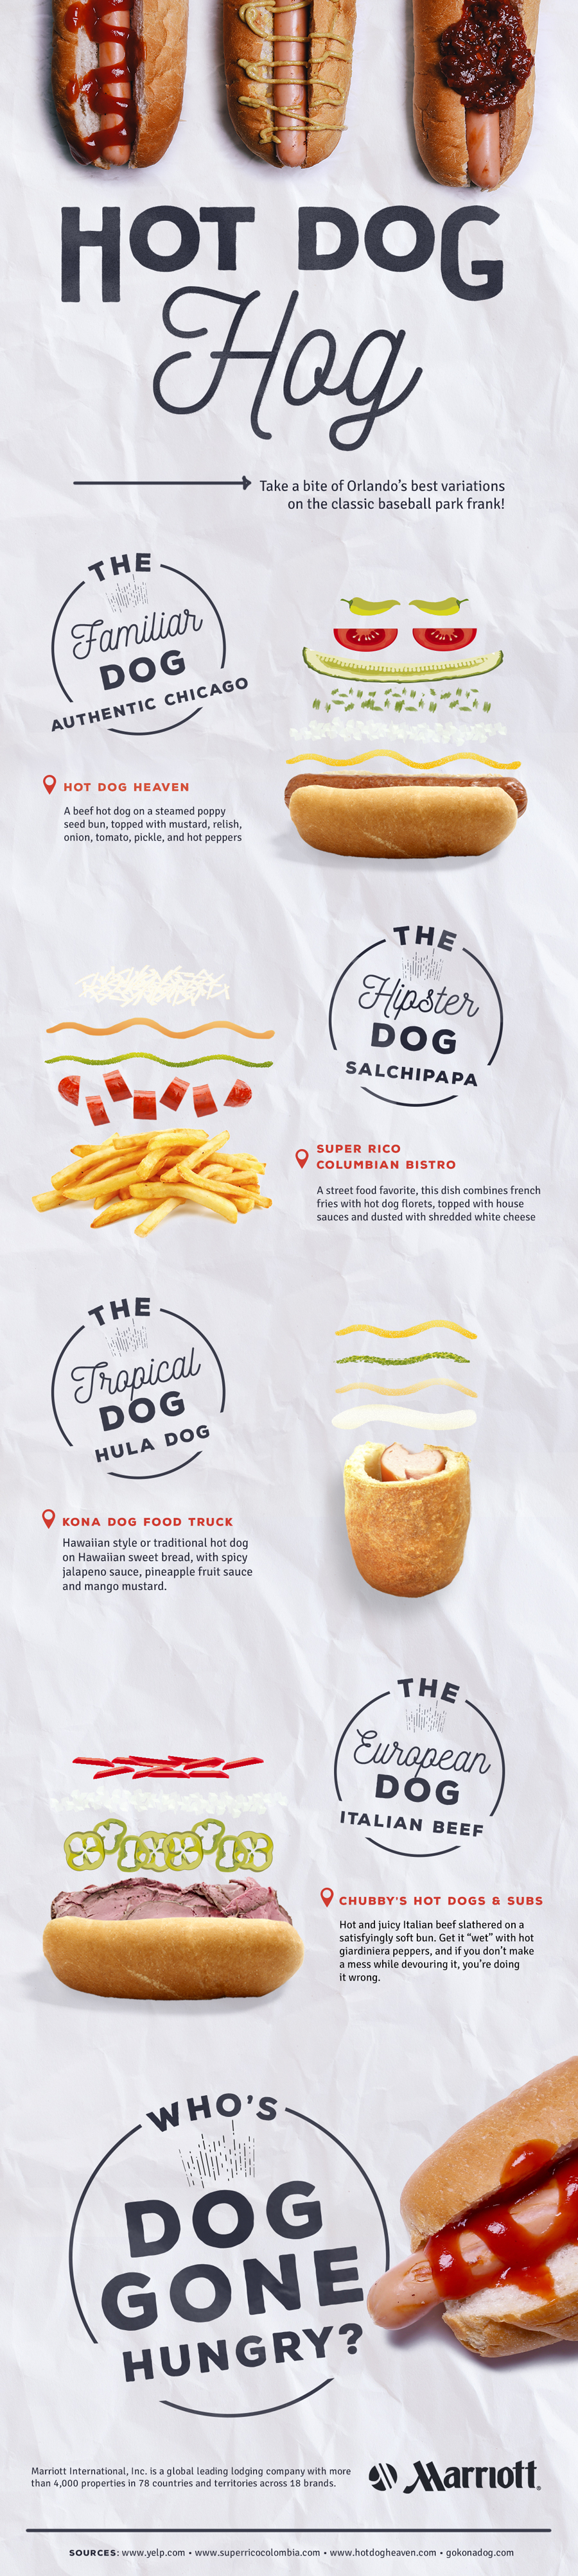 Hot Dog Hog